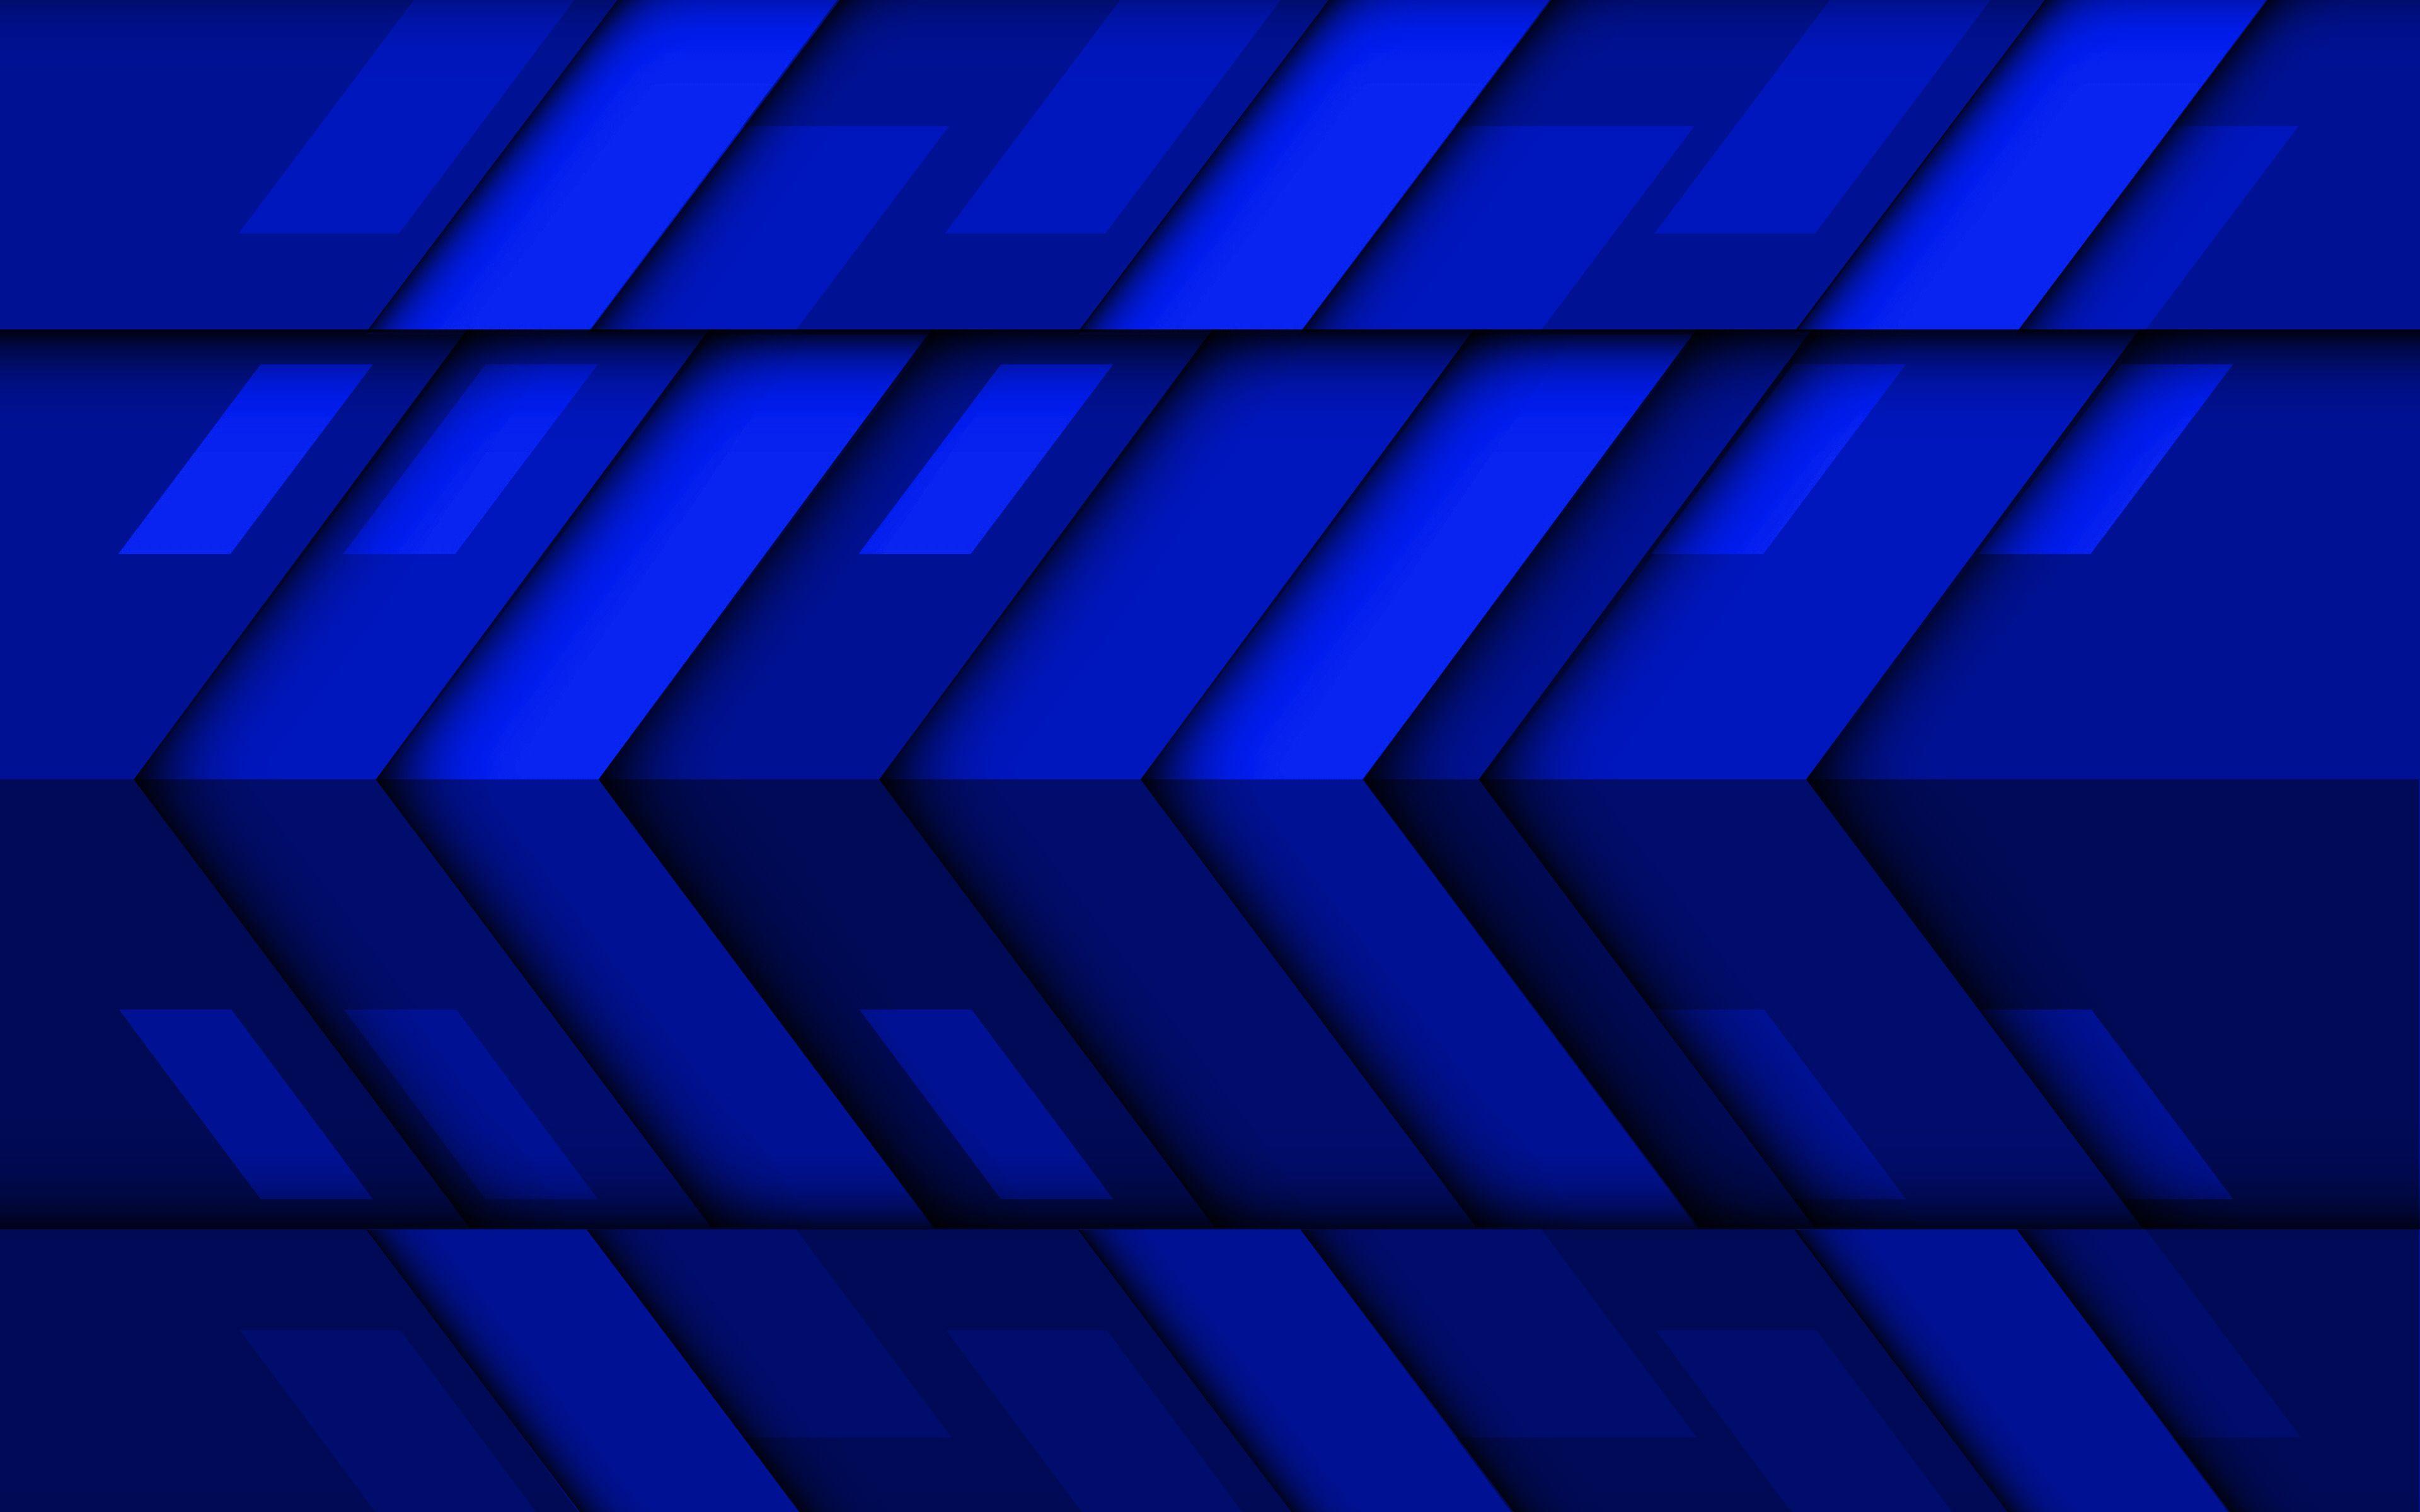 Dark Blue Geometric Wallpapers - Wallpaper Cave